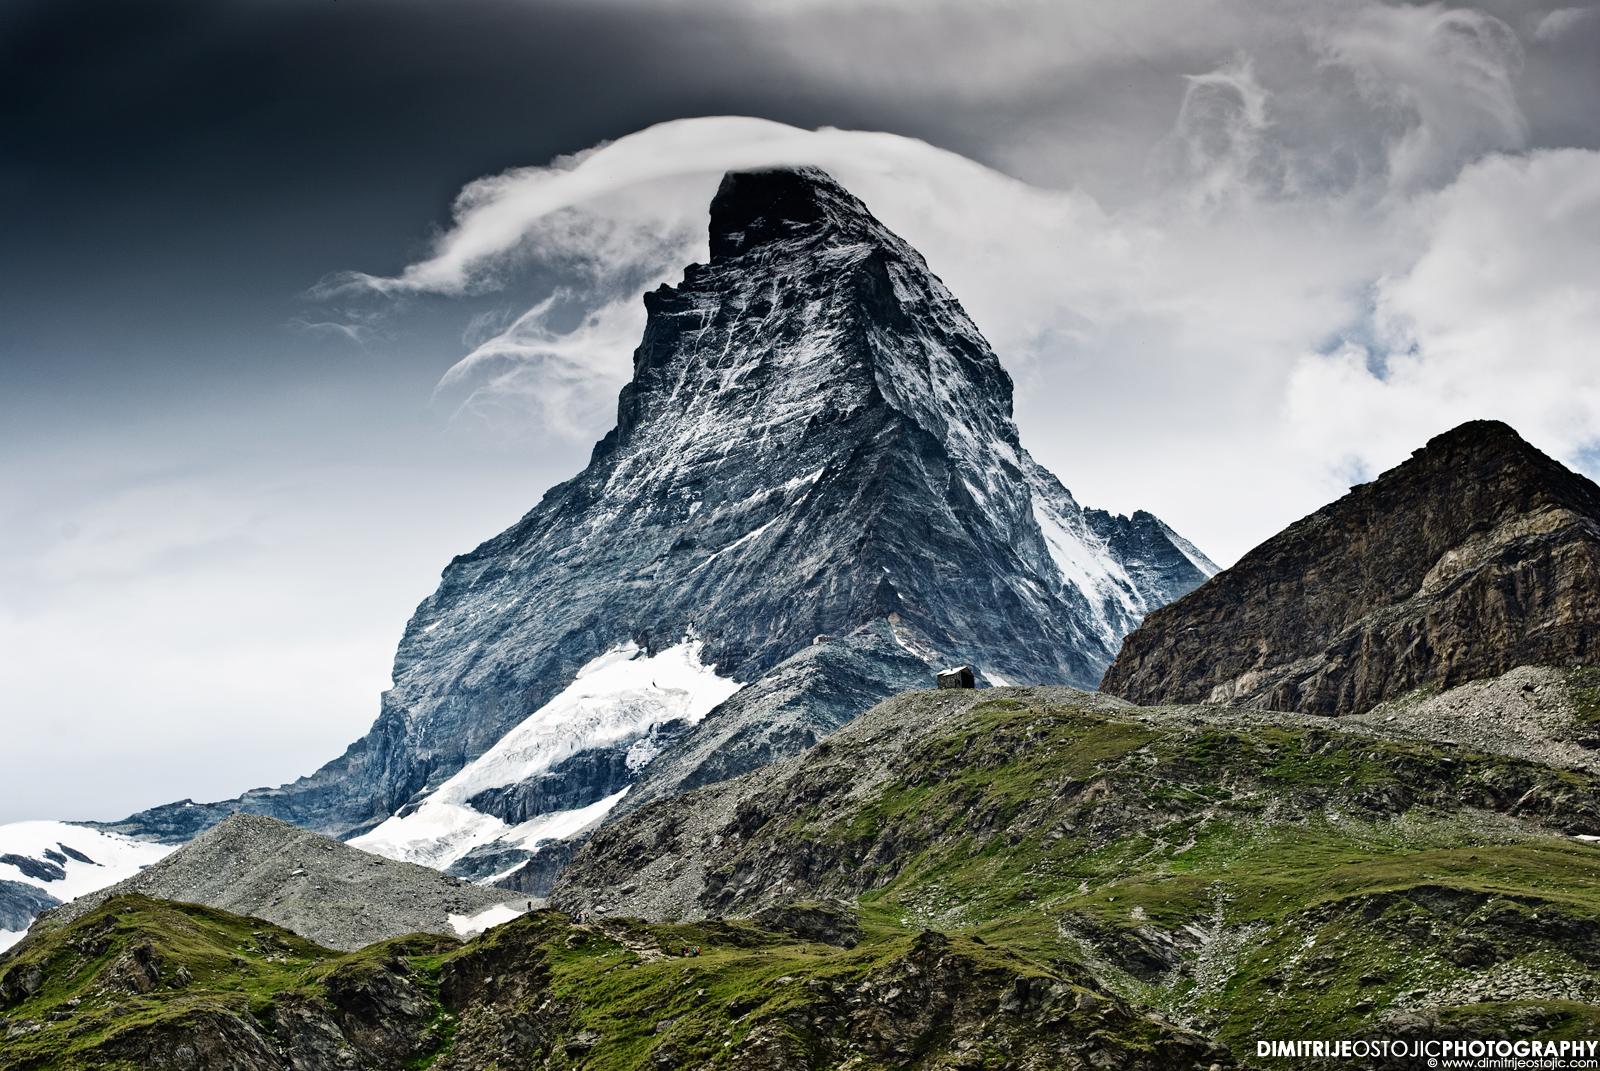 Matterhorn | Dimitrije...